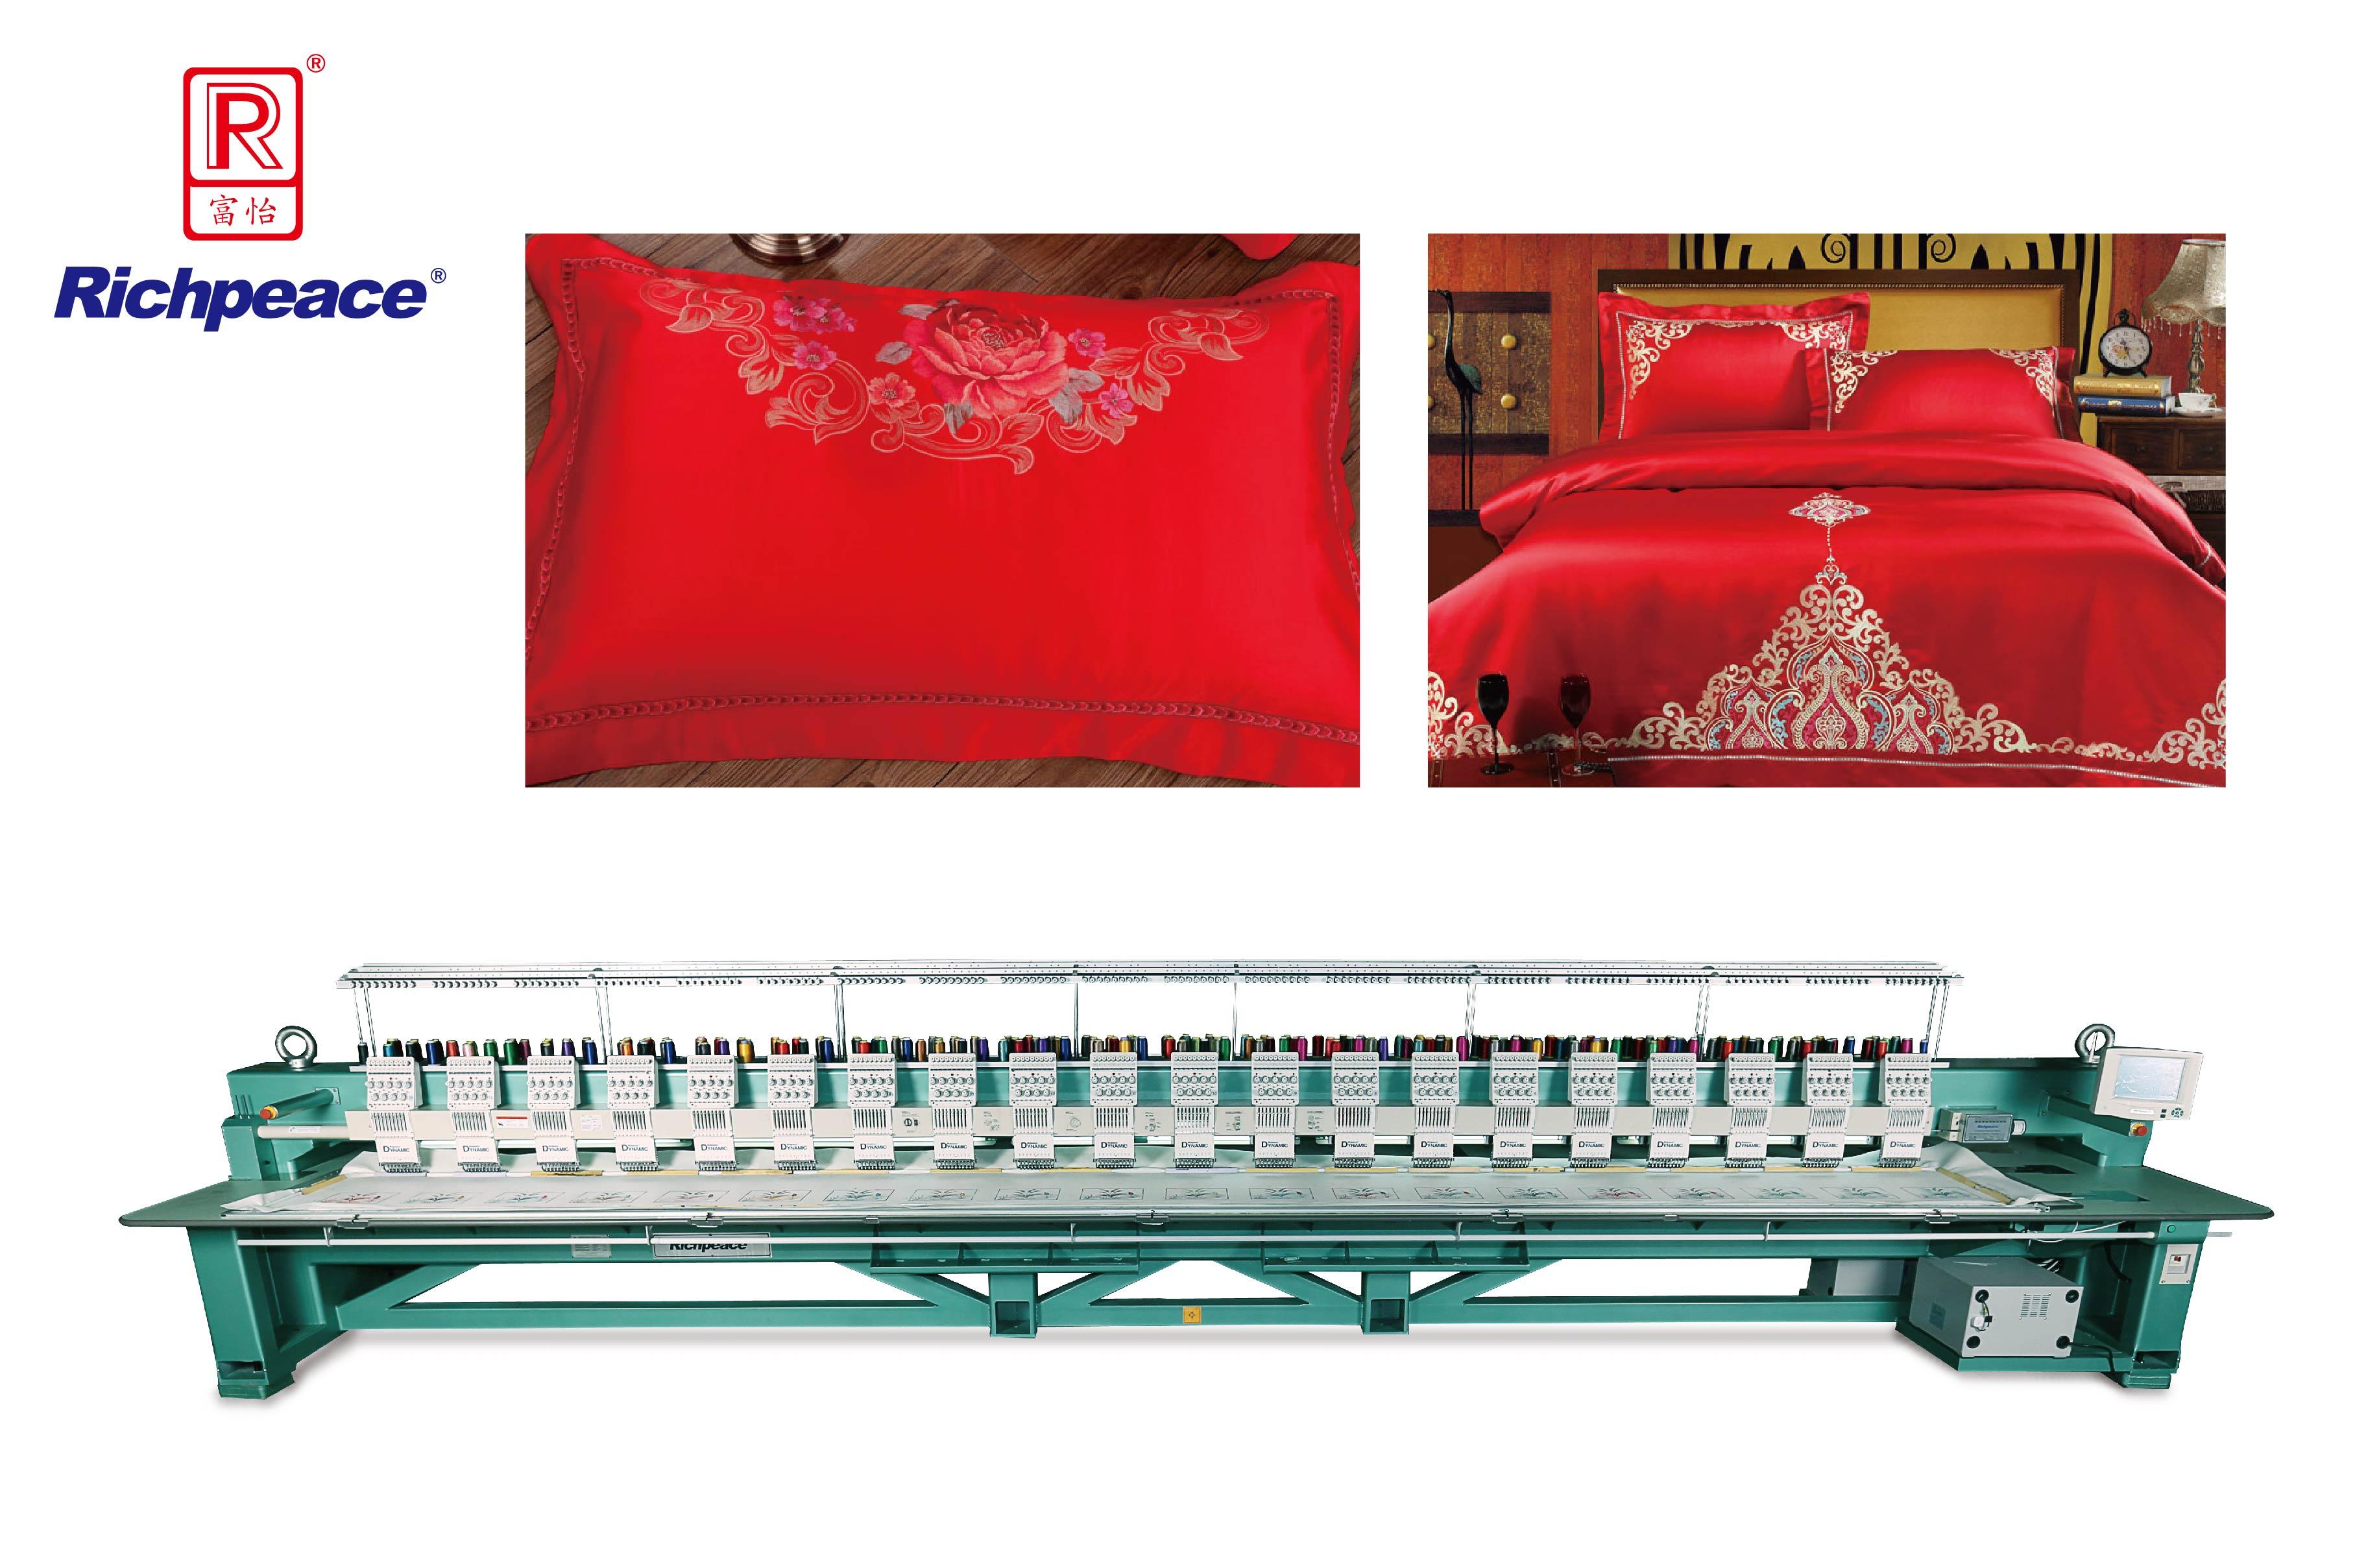 Richpeace Computerized Precise Flat Embroidery Machine